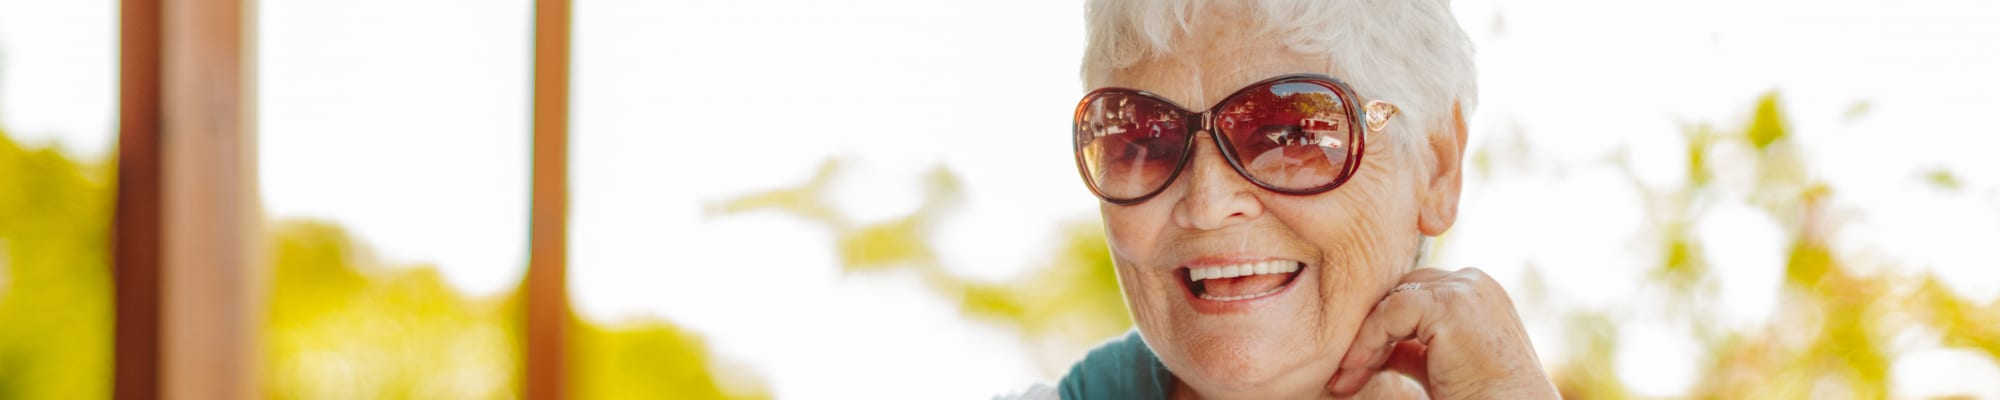 Reviews of Walker's Trail Senior Living in Danville, Kentucky